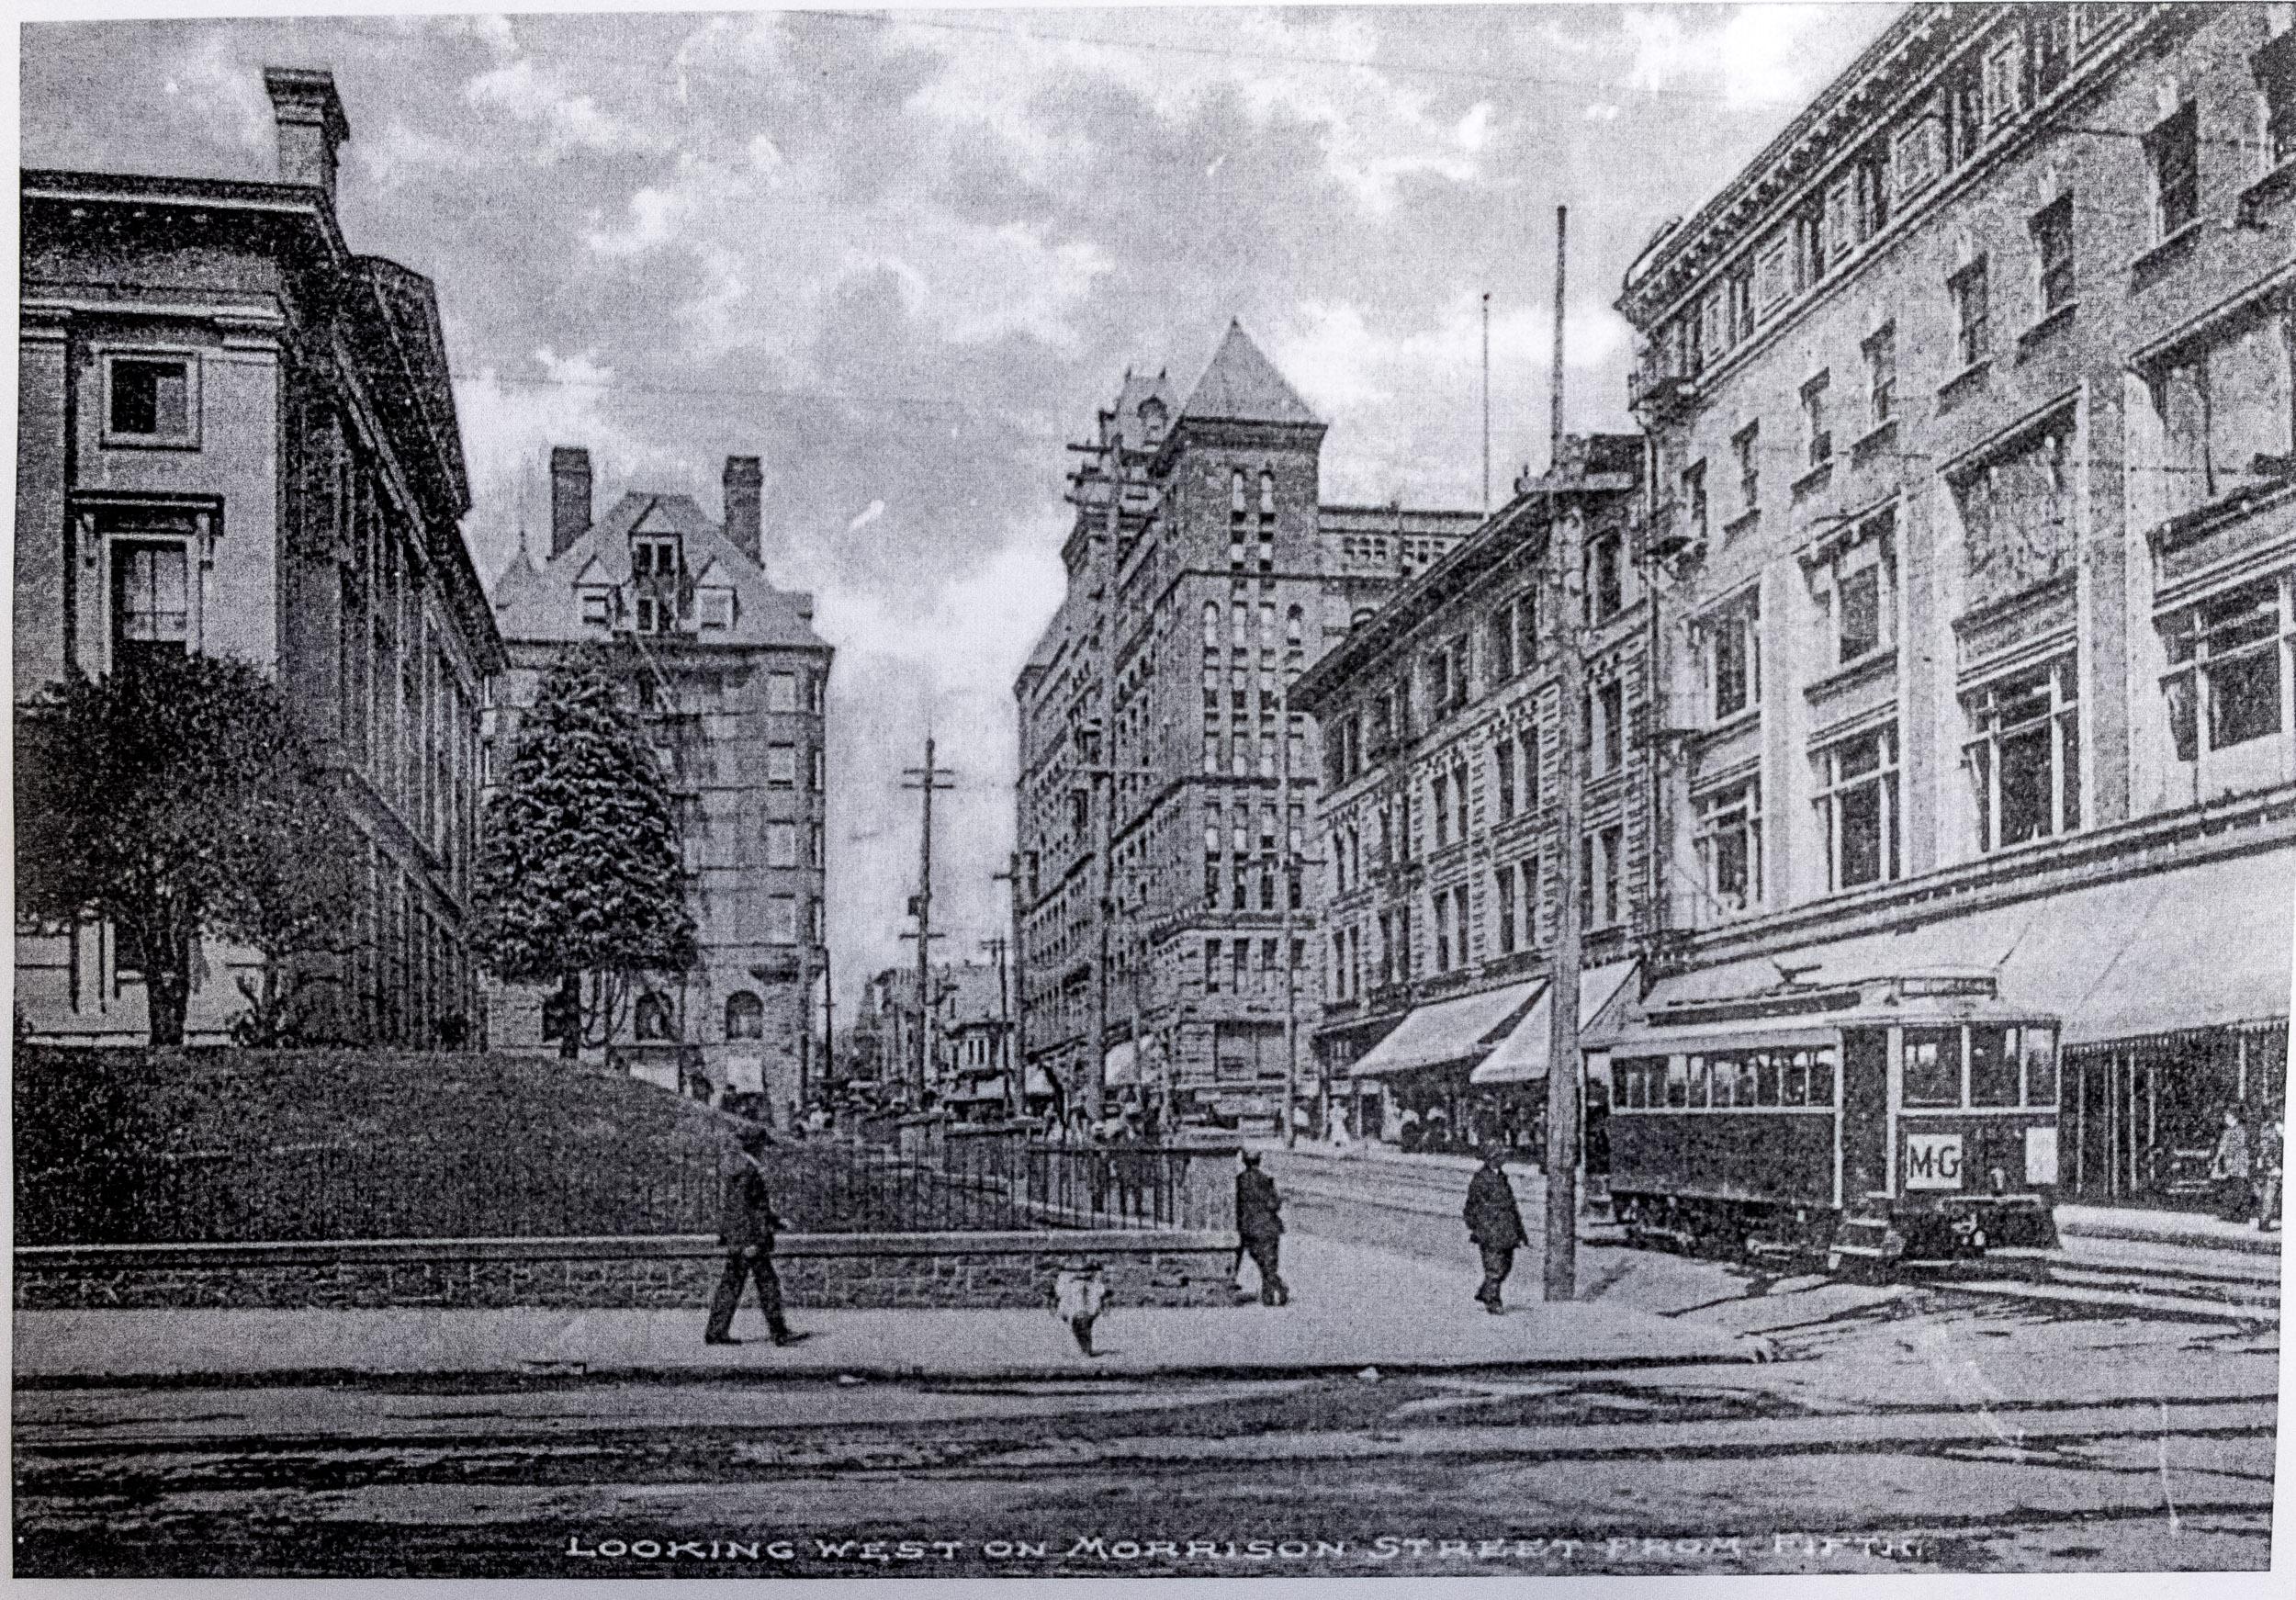 Scene from downtown Morrison Street, 1907